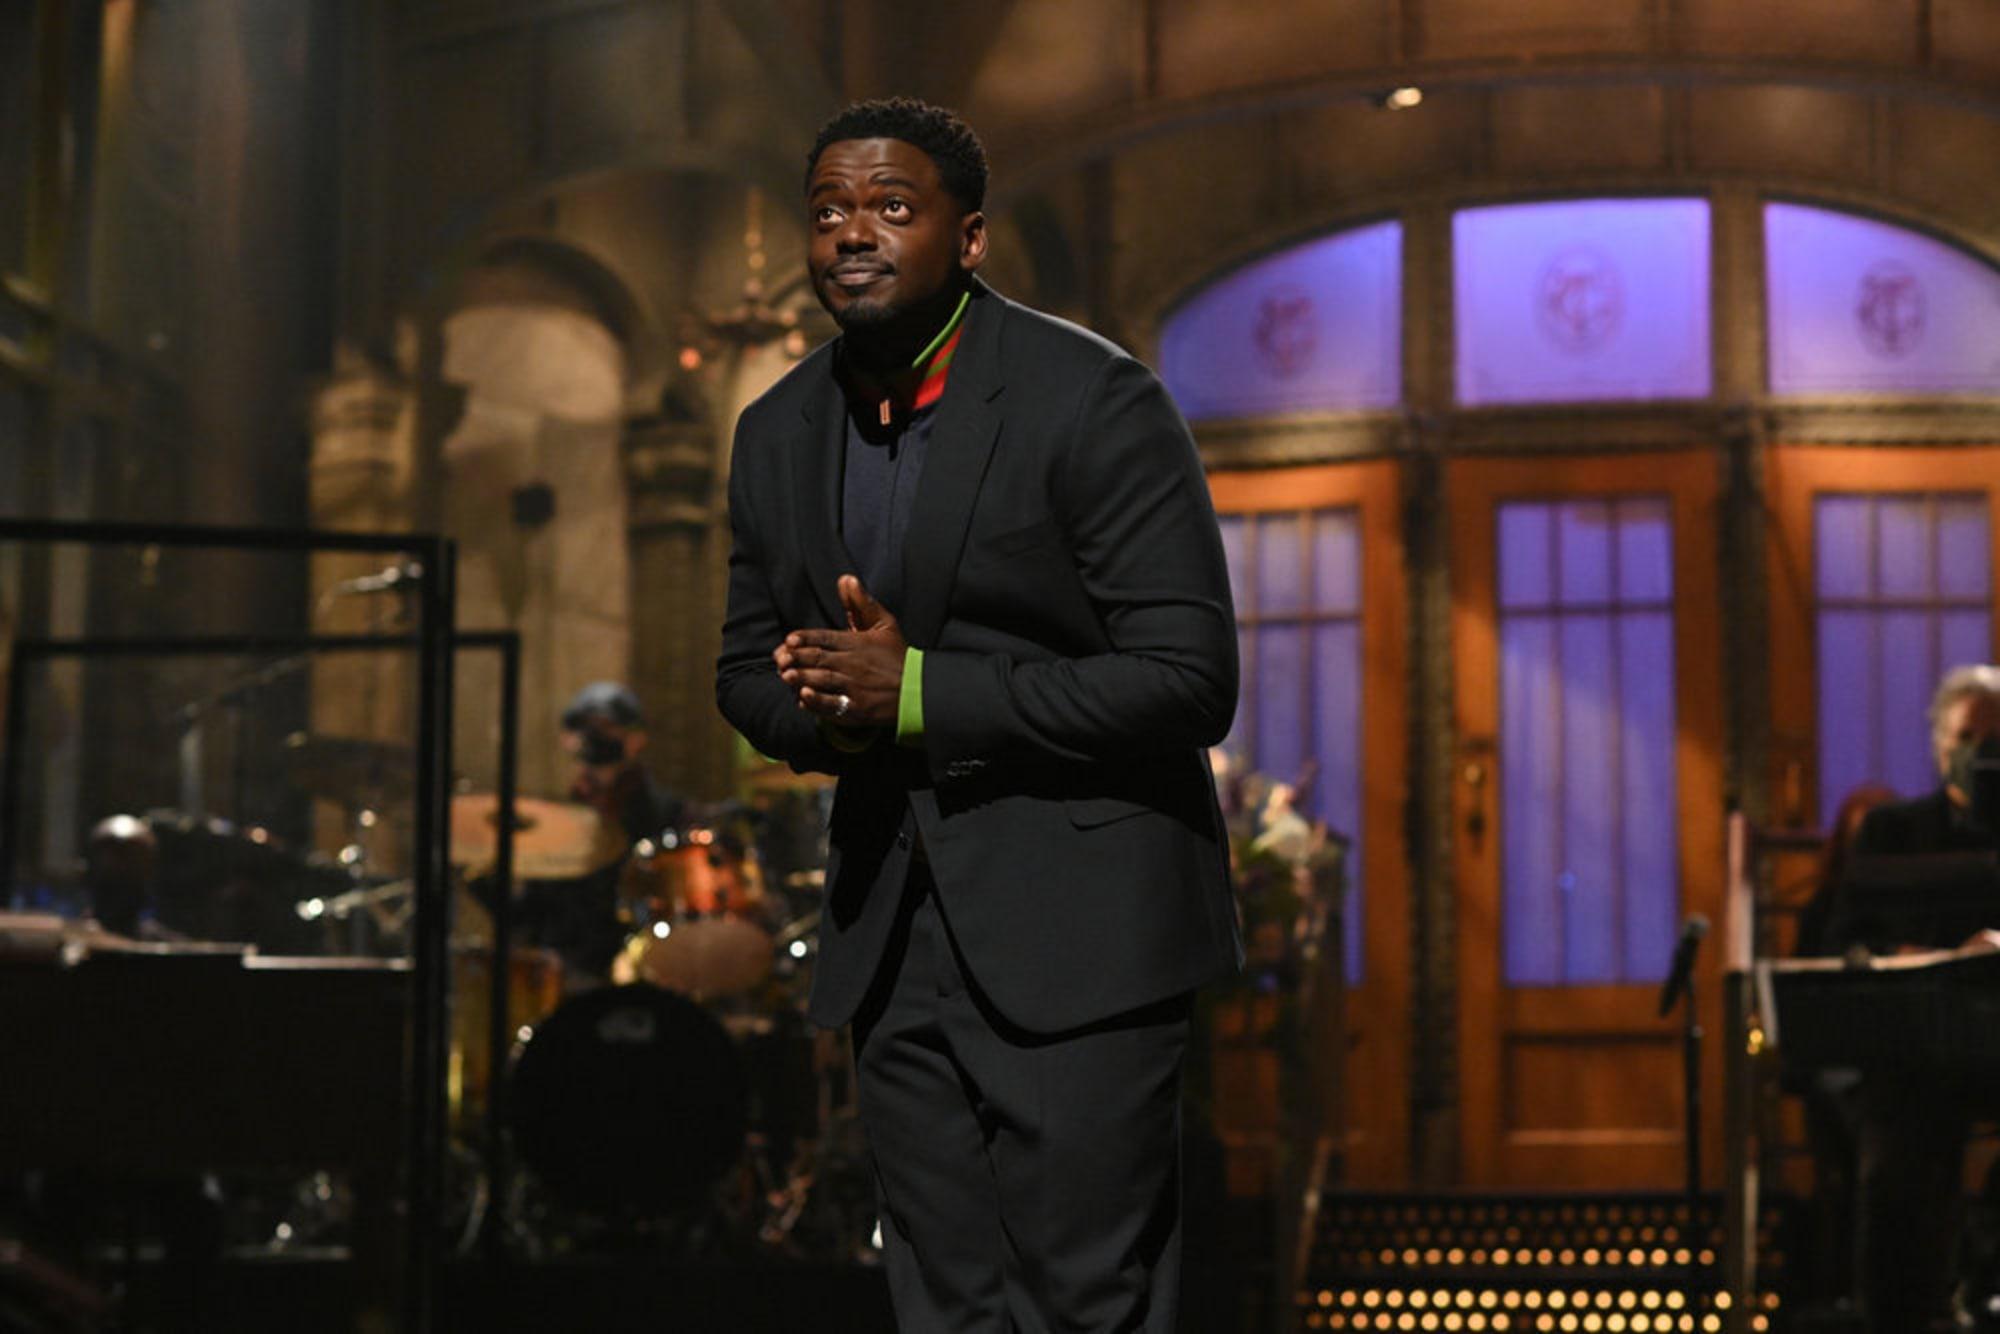 Who's hosting Saturday Night Live tonight, June 12?